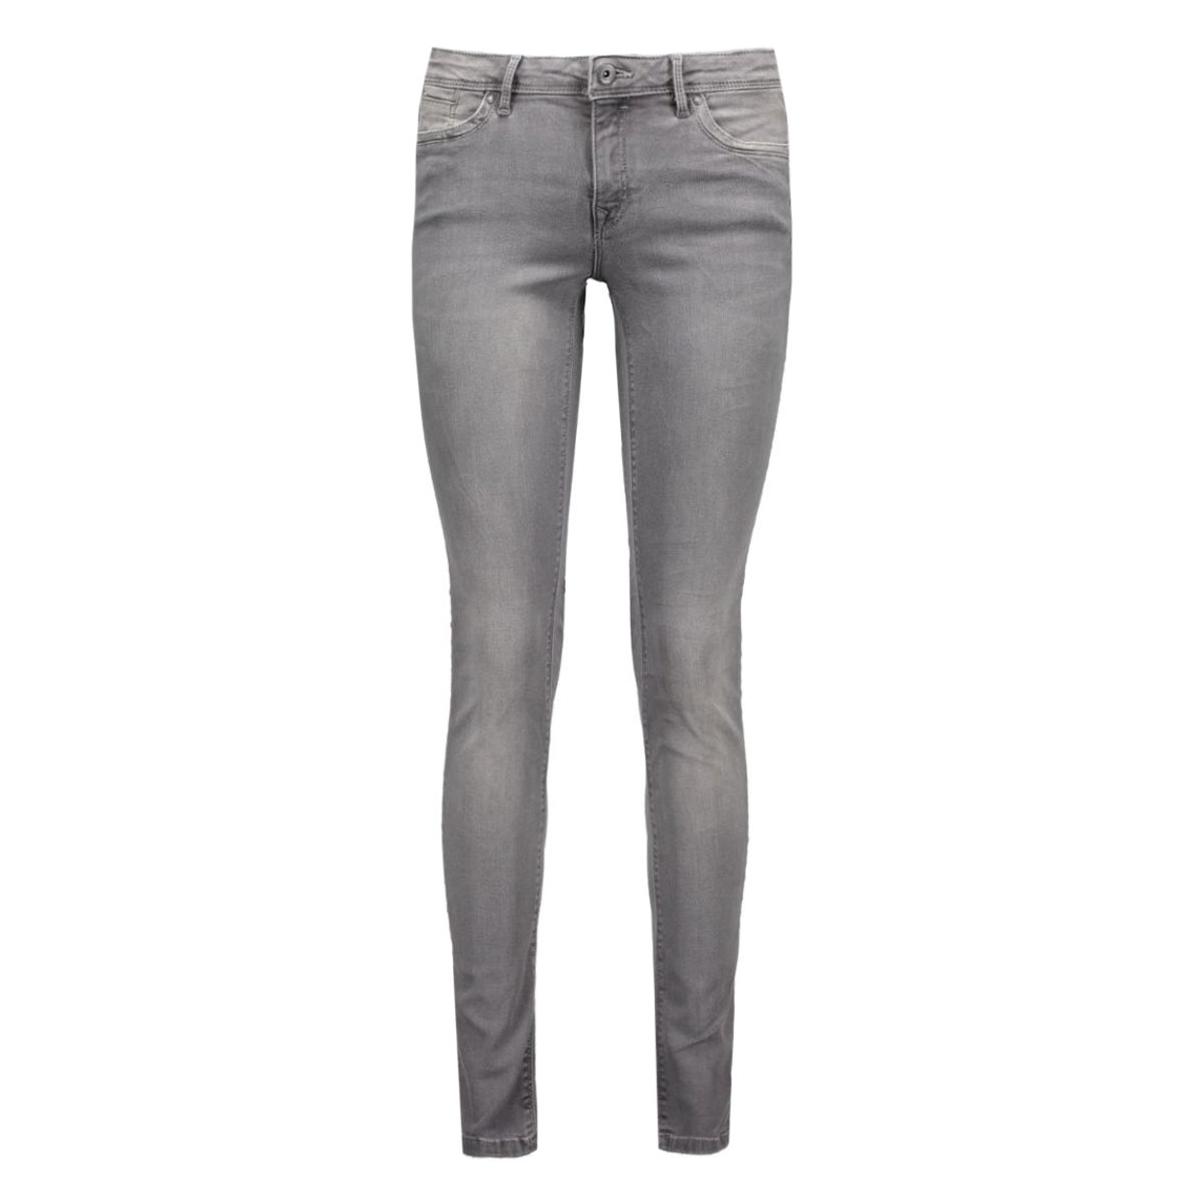 996cc1b914 edc jeans c921